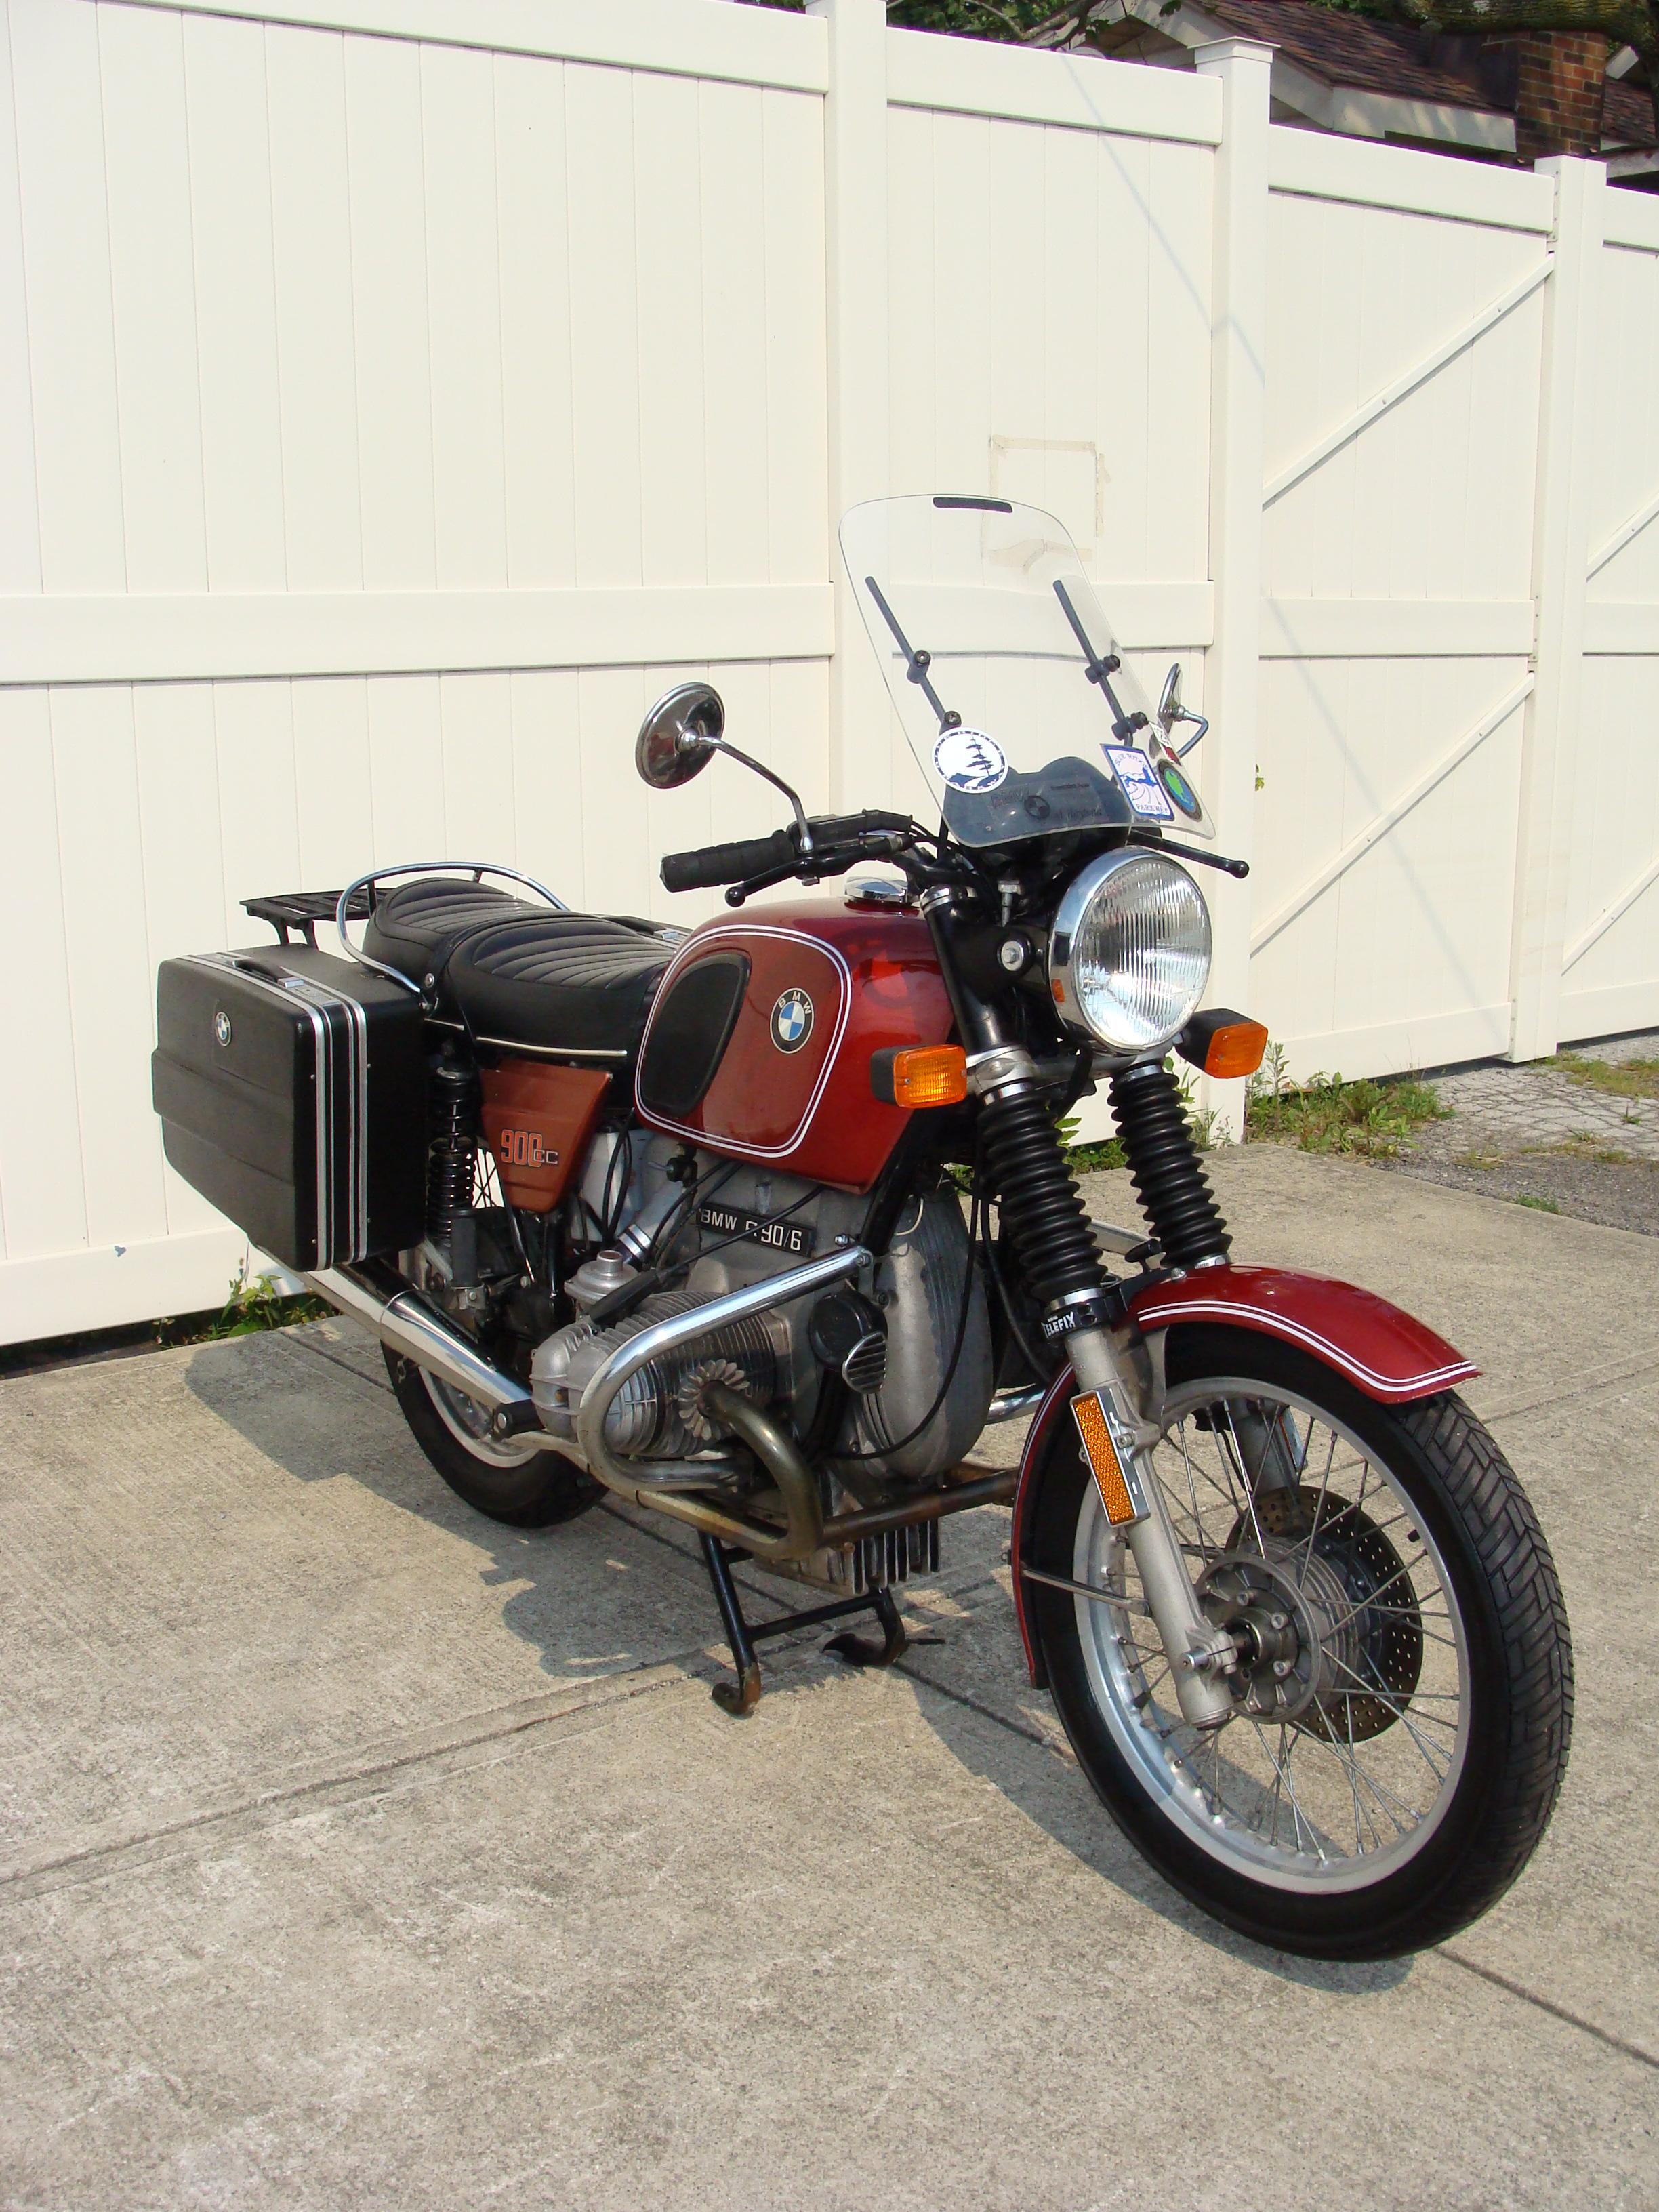 4964226 75 r90 6 copper 025 sold 4964226 1976 bmw r90 6 rh repsyclebmw picturepush com 1974 BMW Motorcycle BMW Motorcycles Green